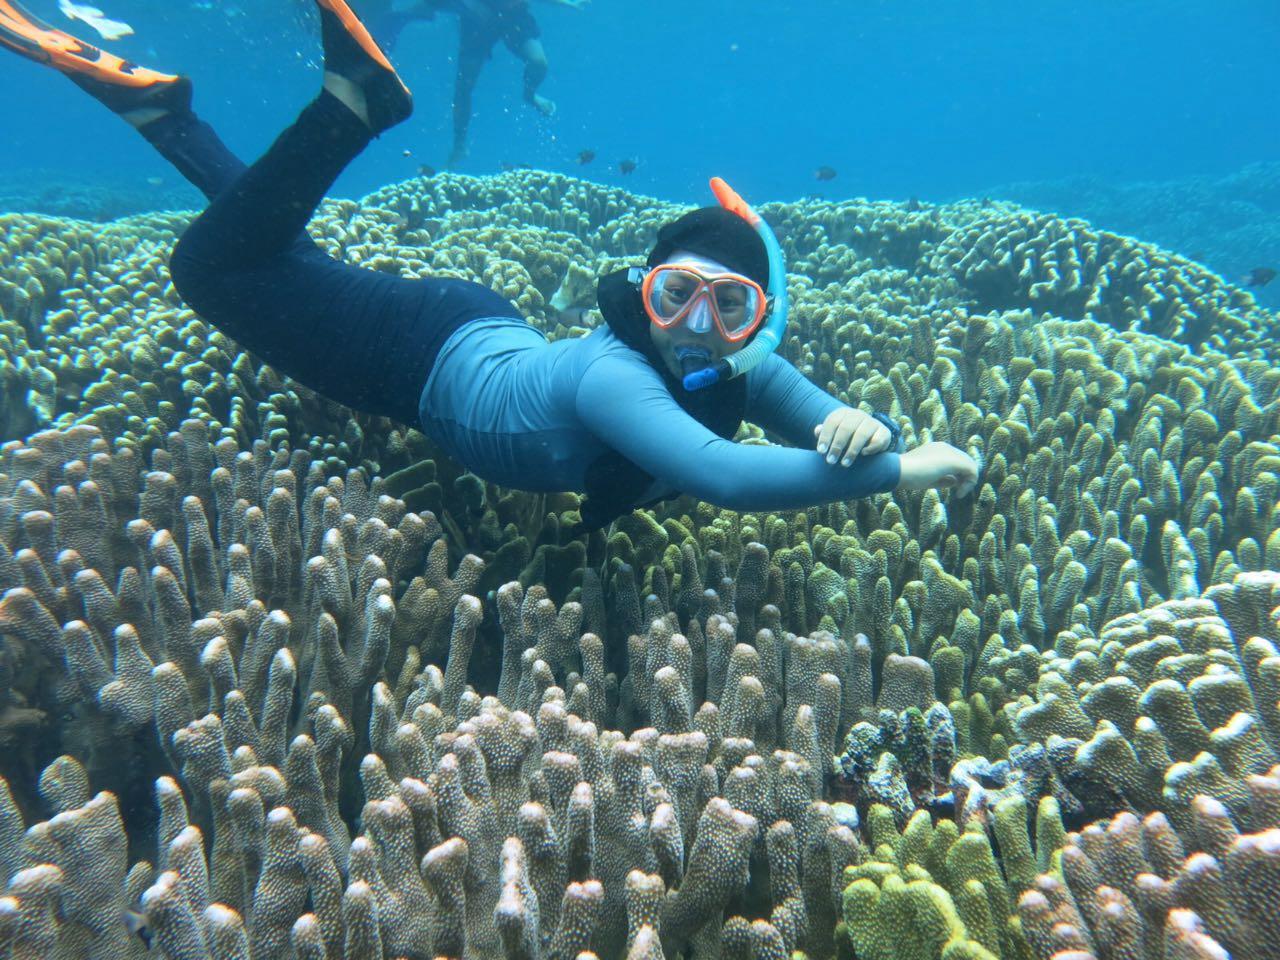 0852 9994 4169 Paket Wisata Gorontalo Taman Laut Olele 1